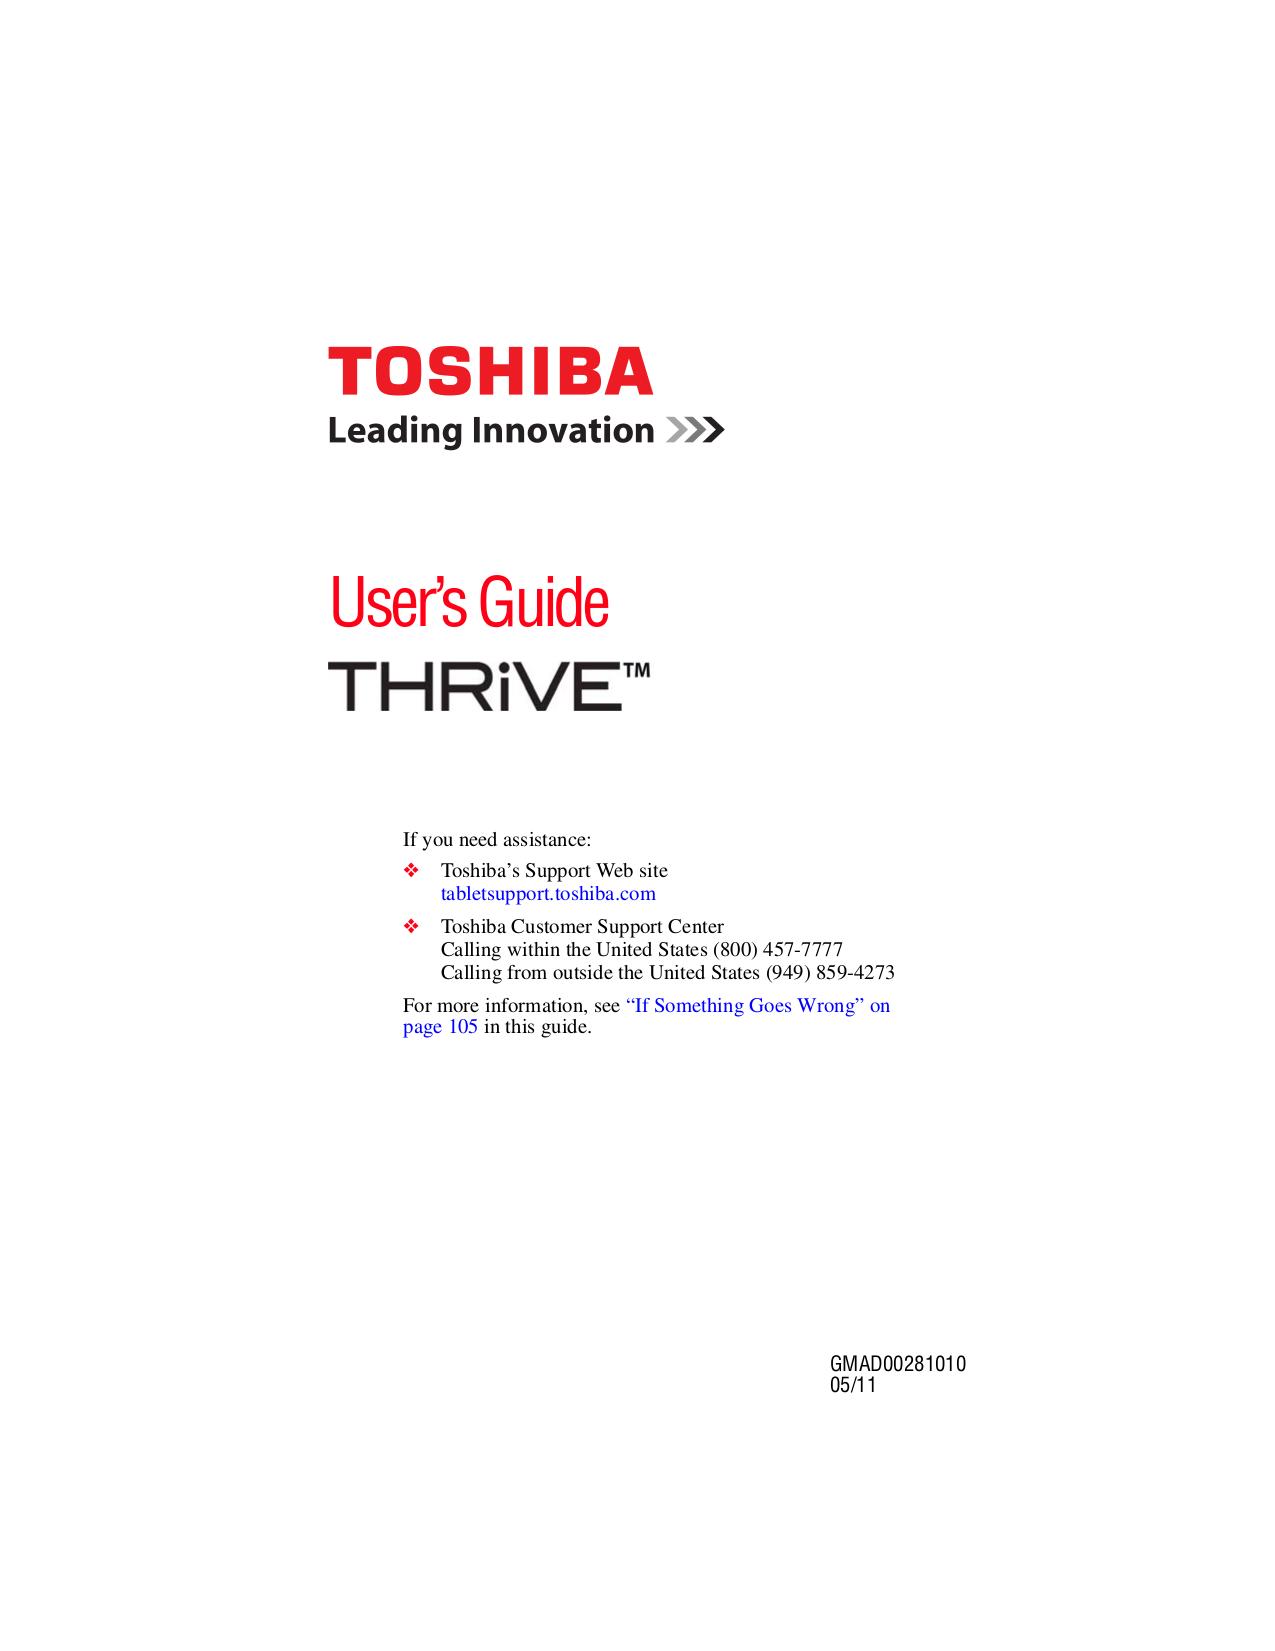 pdf manual for toshiba tablet thrive 10 1 8gb rh umlib com Thrive Supplements Toshiba Thrive Battery